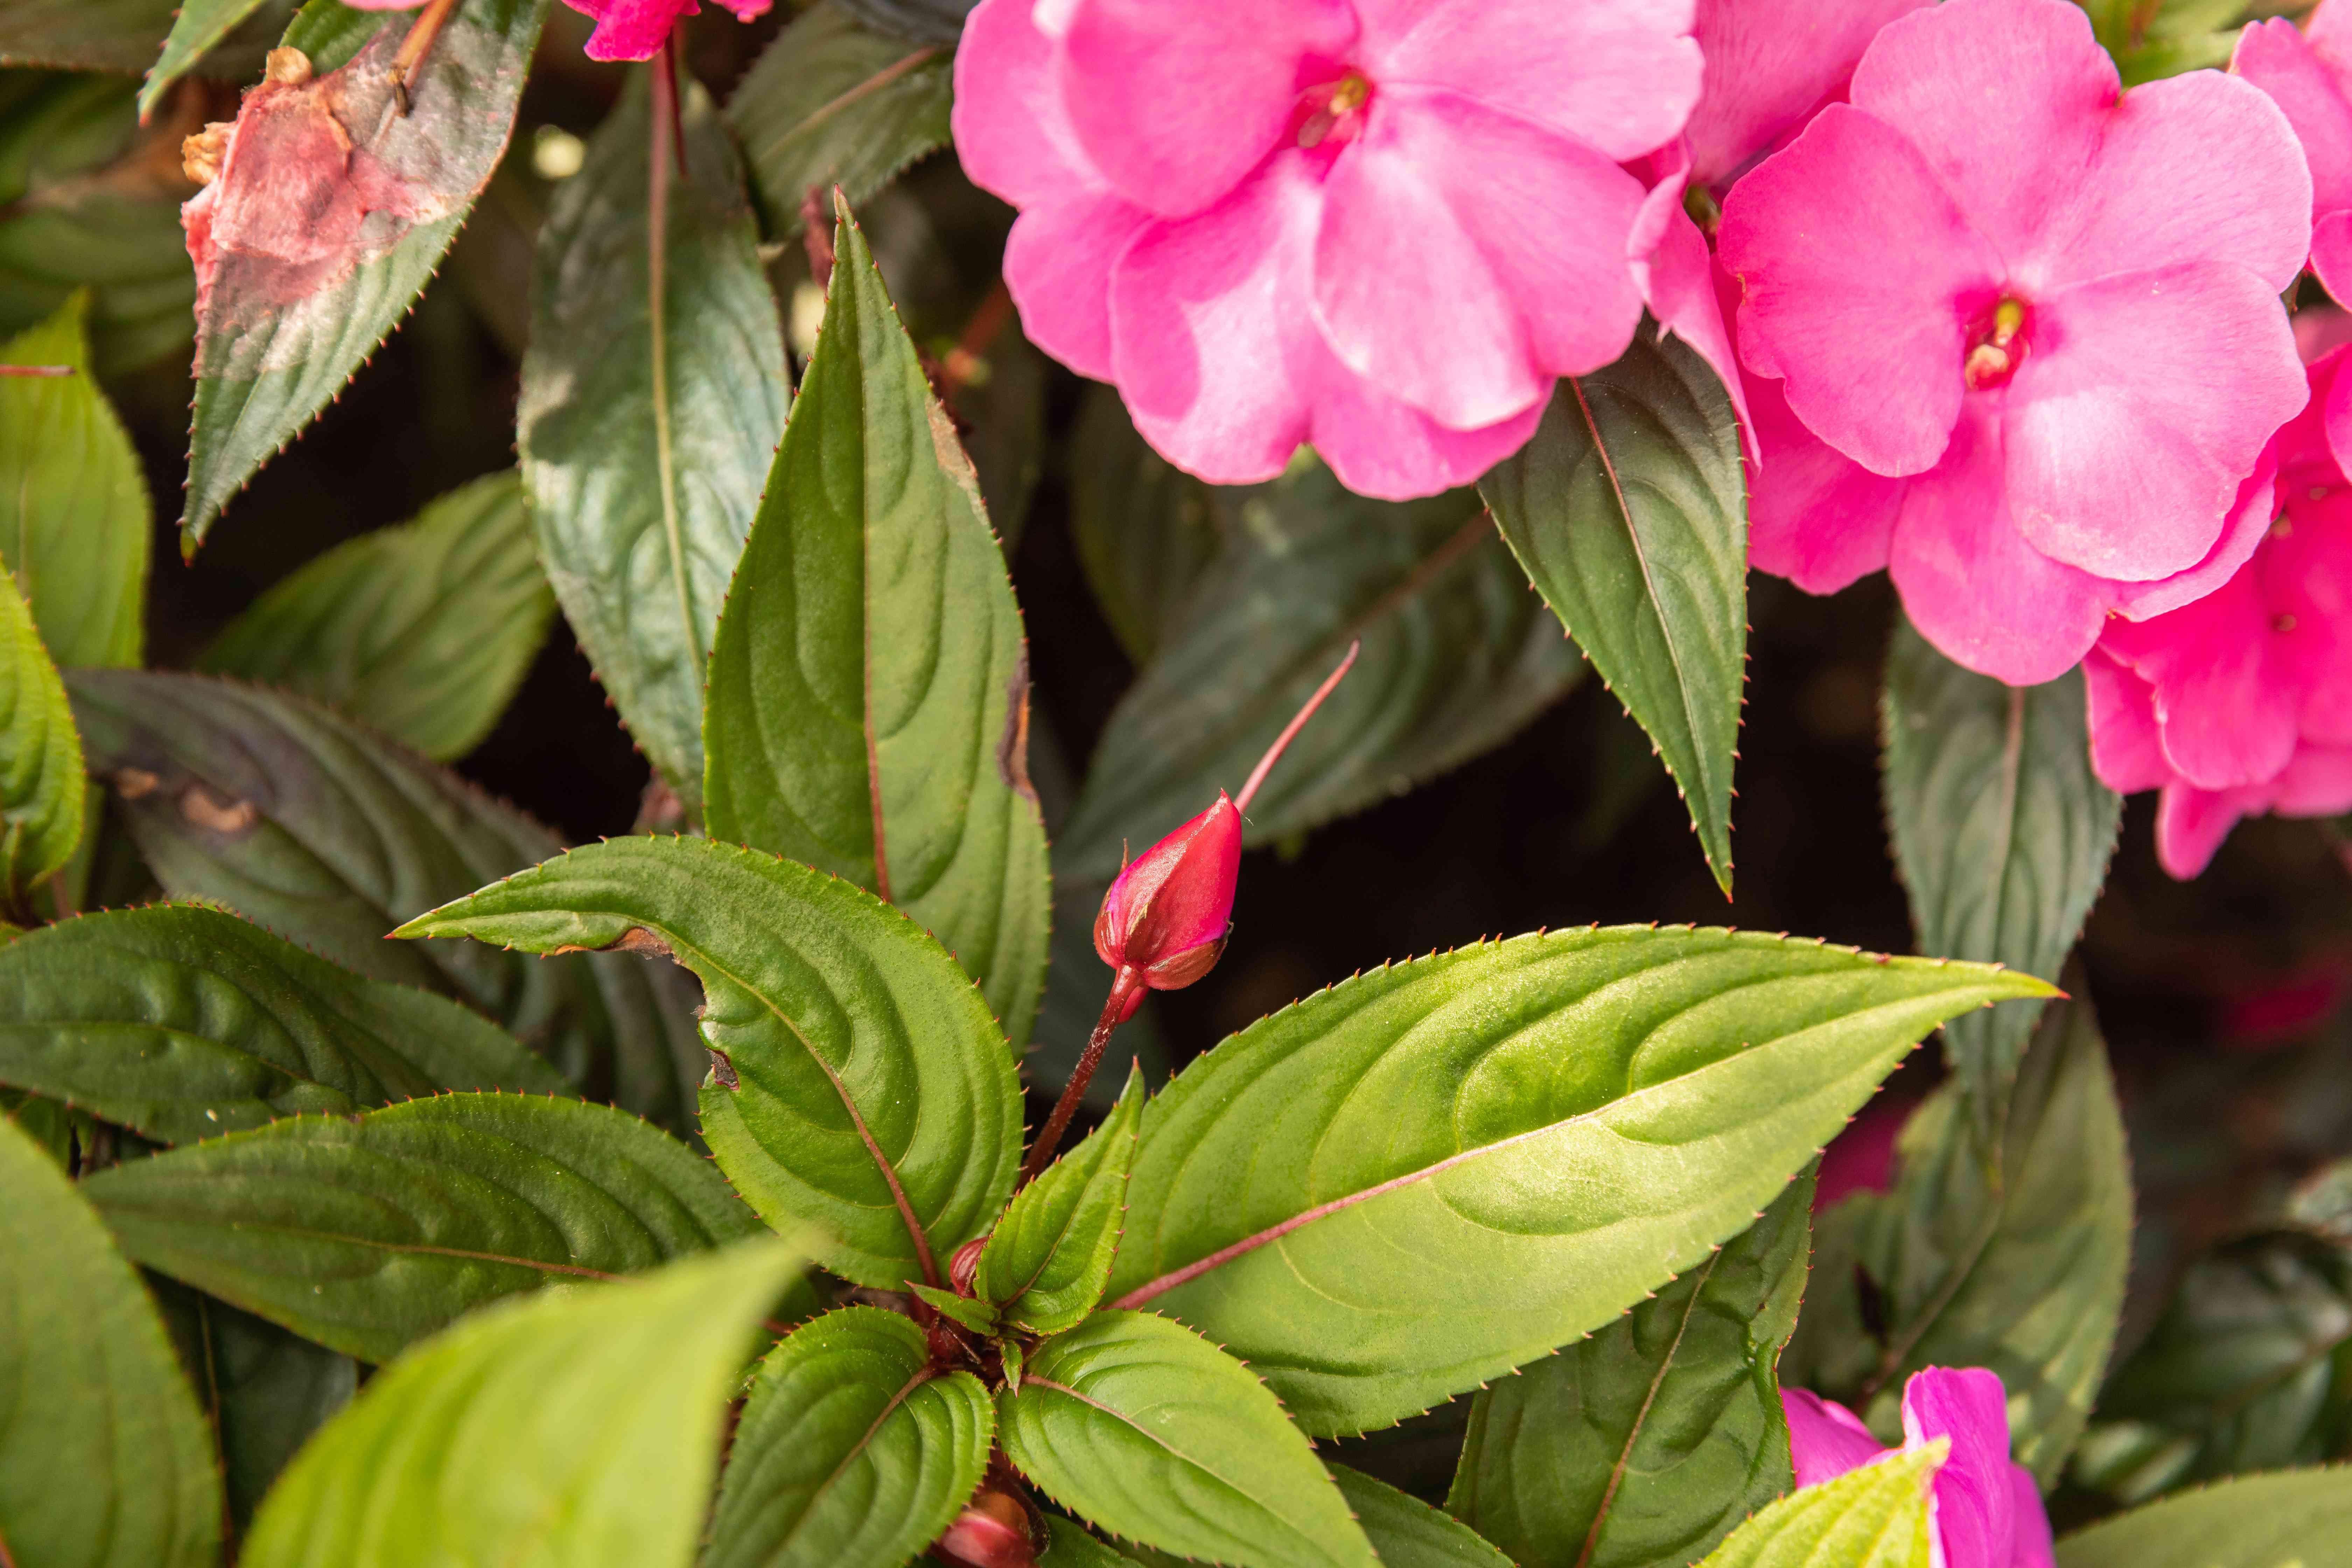 new bud on a New Guinea impatiens shrub